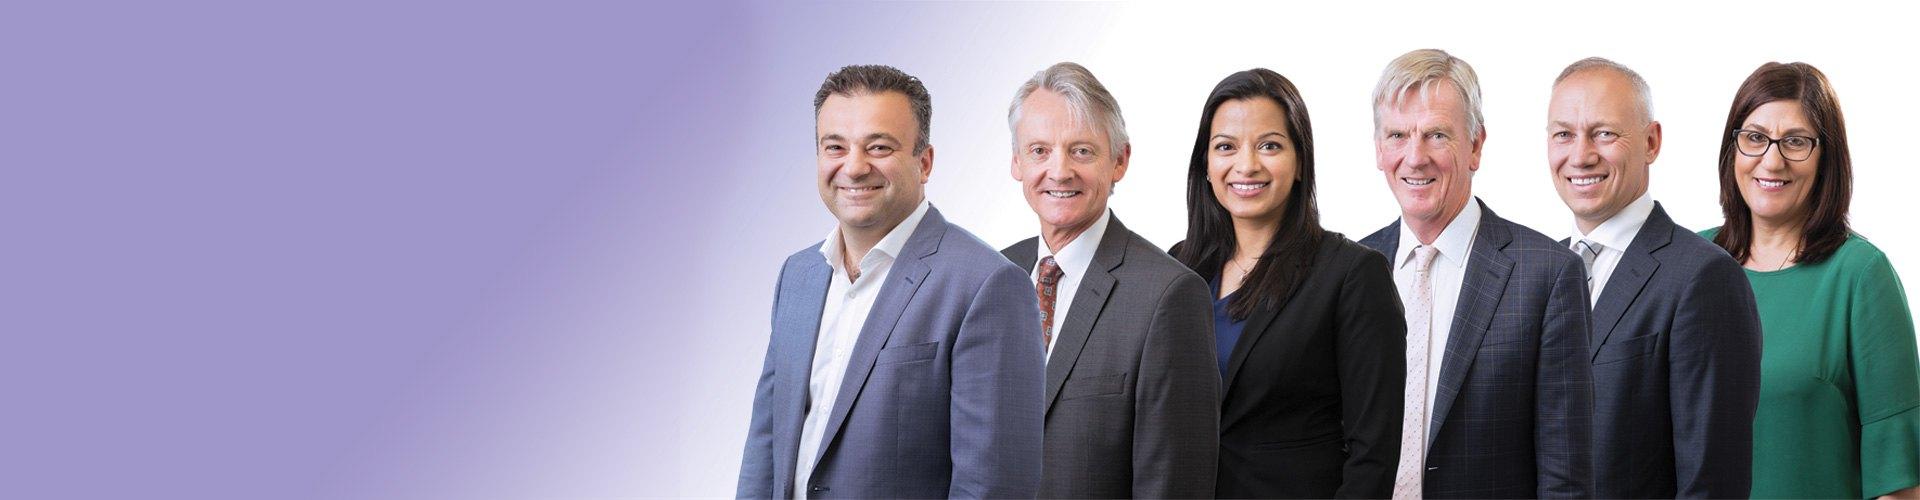 urologist Melbourne